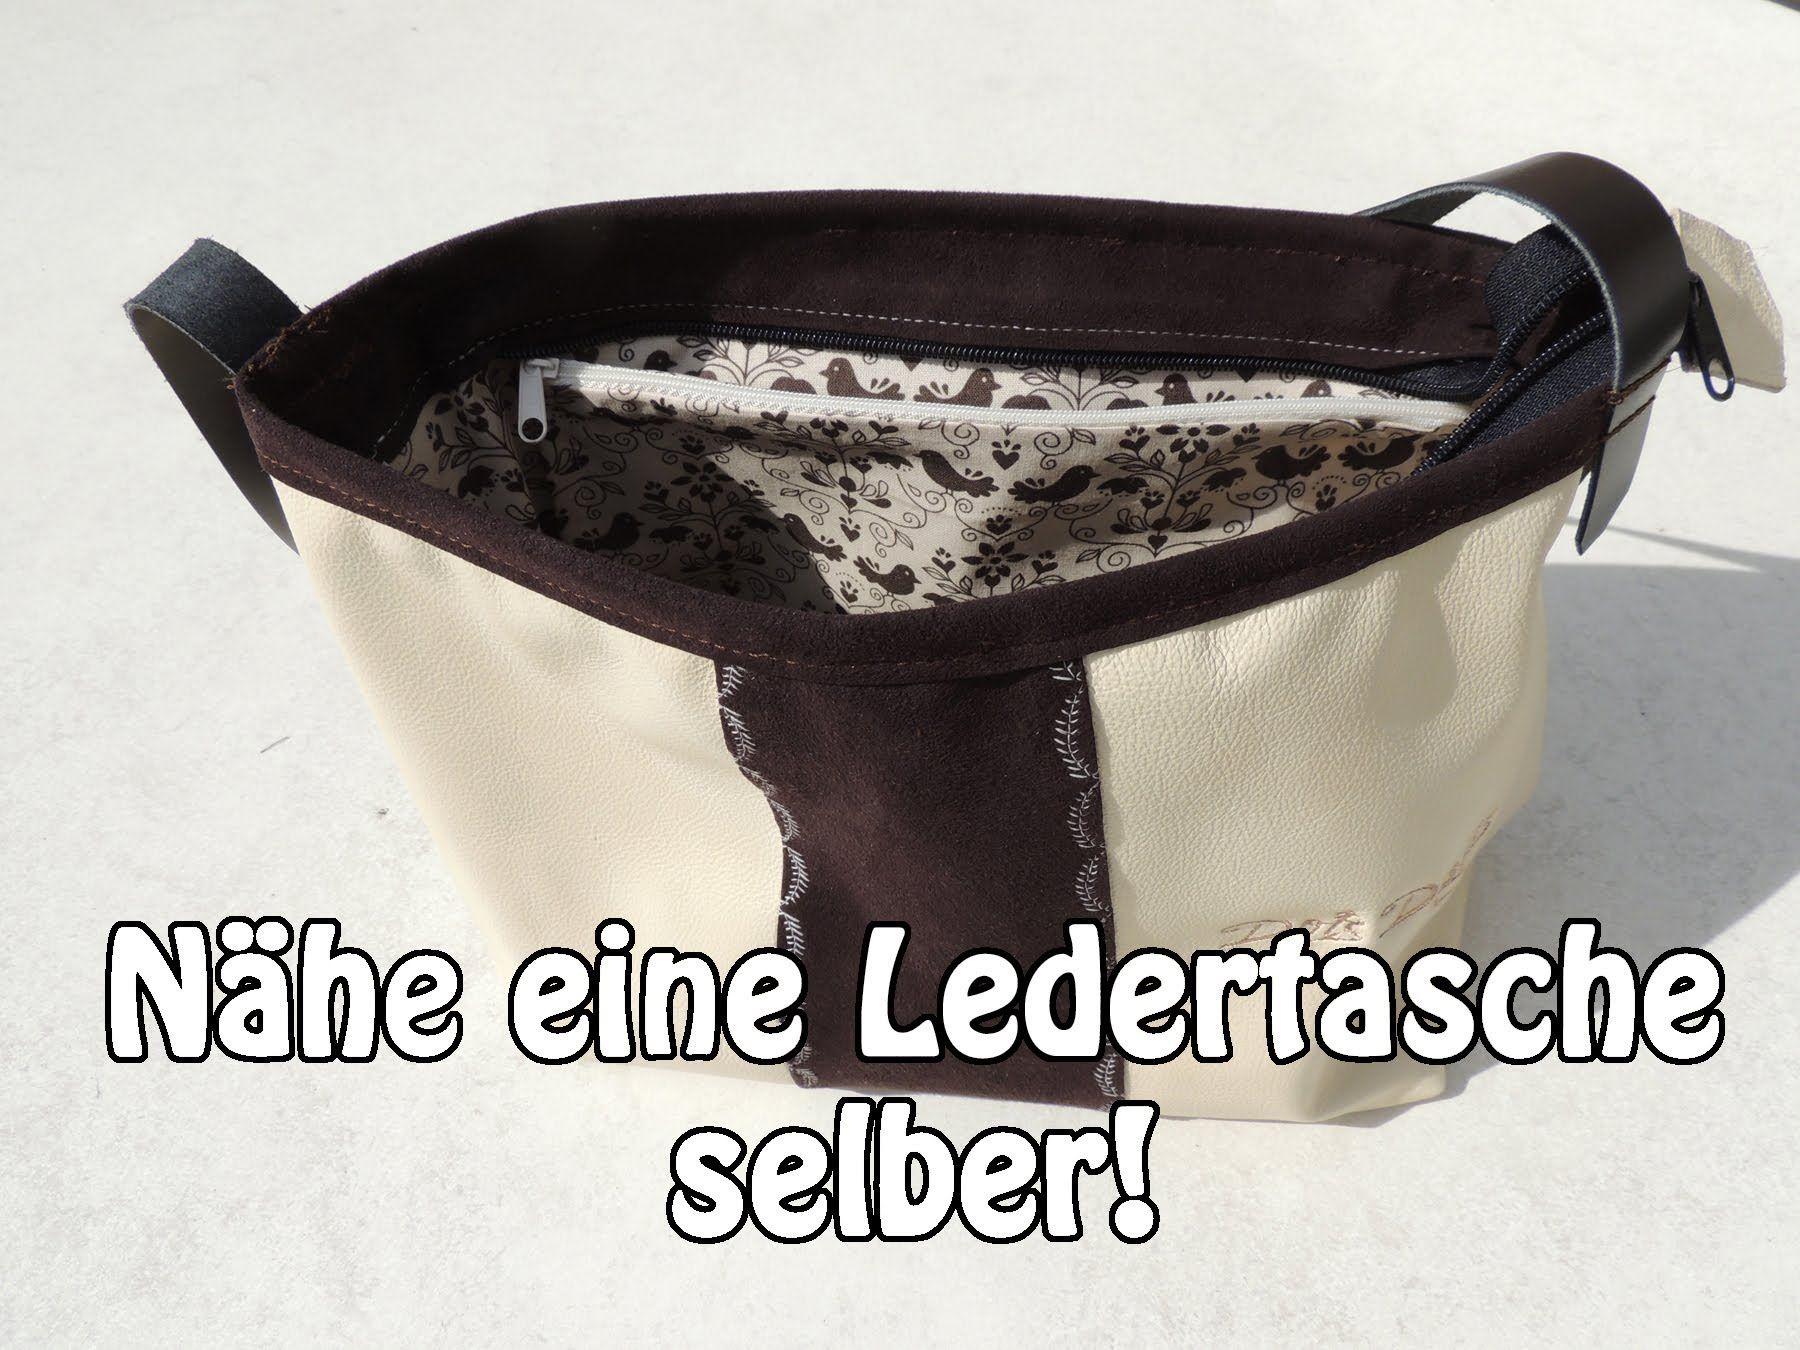 DIY | Ledertasche Handtasche selber nähen | Nähen für Anfänger ...